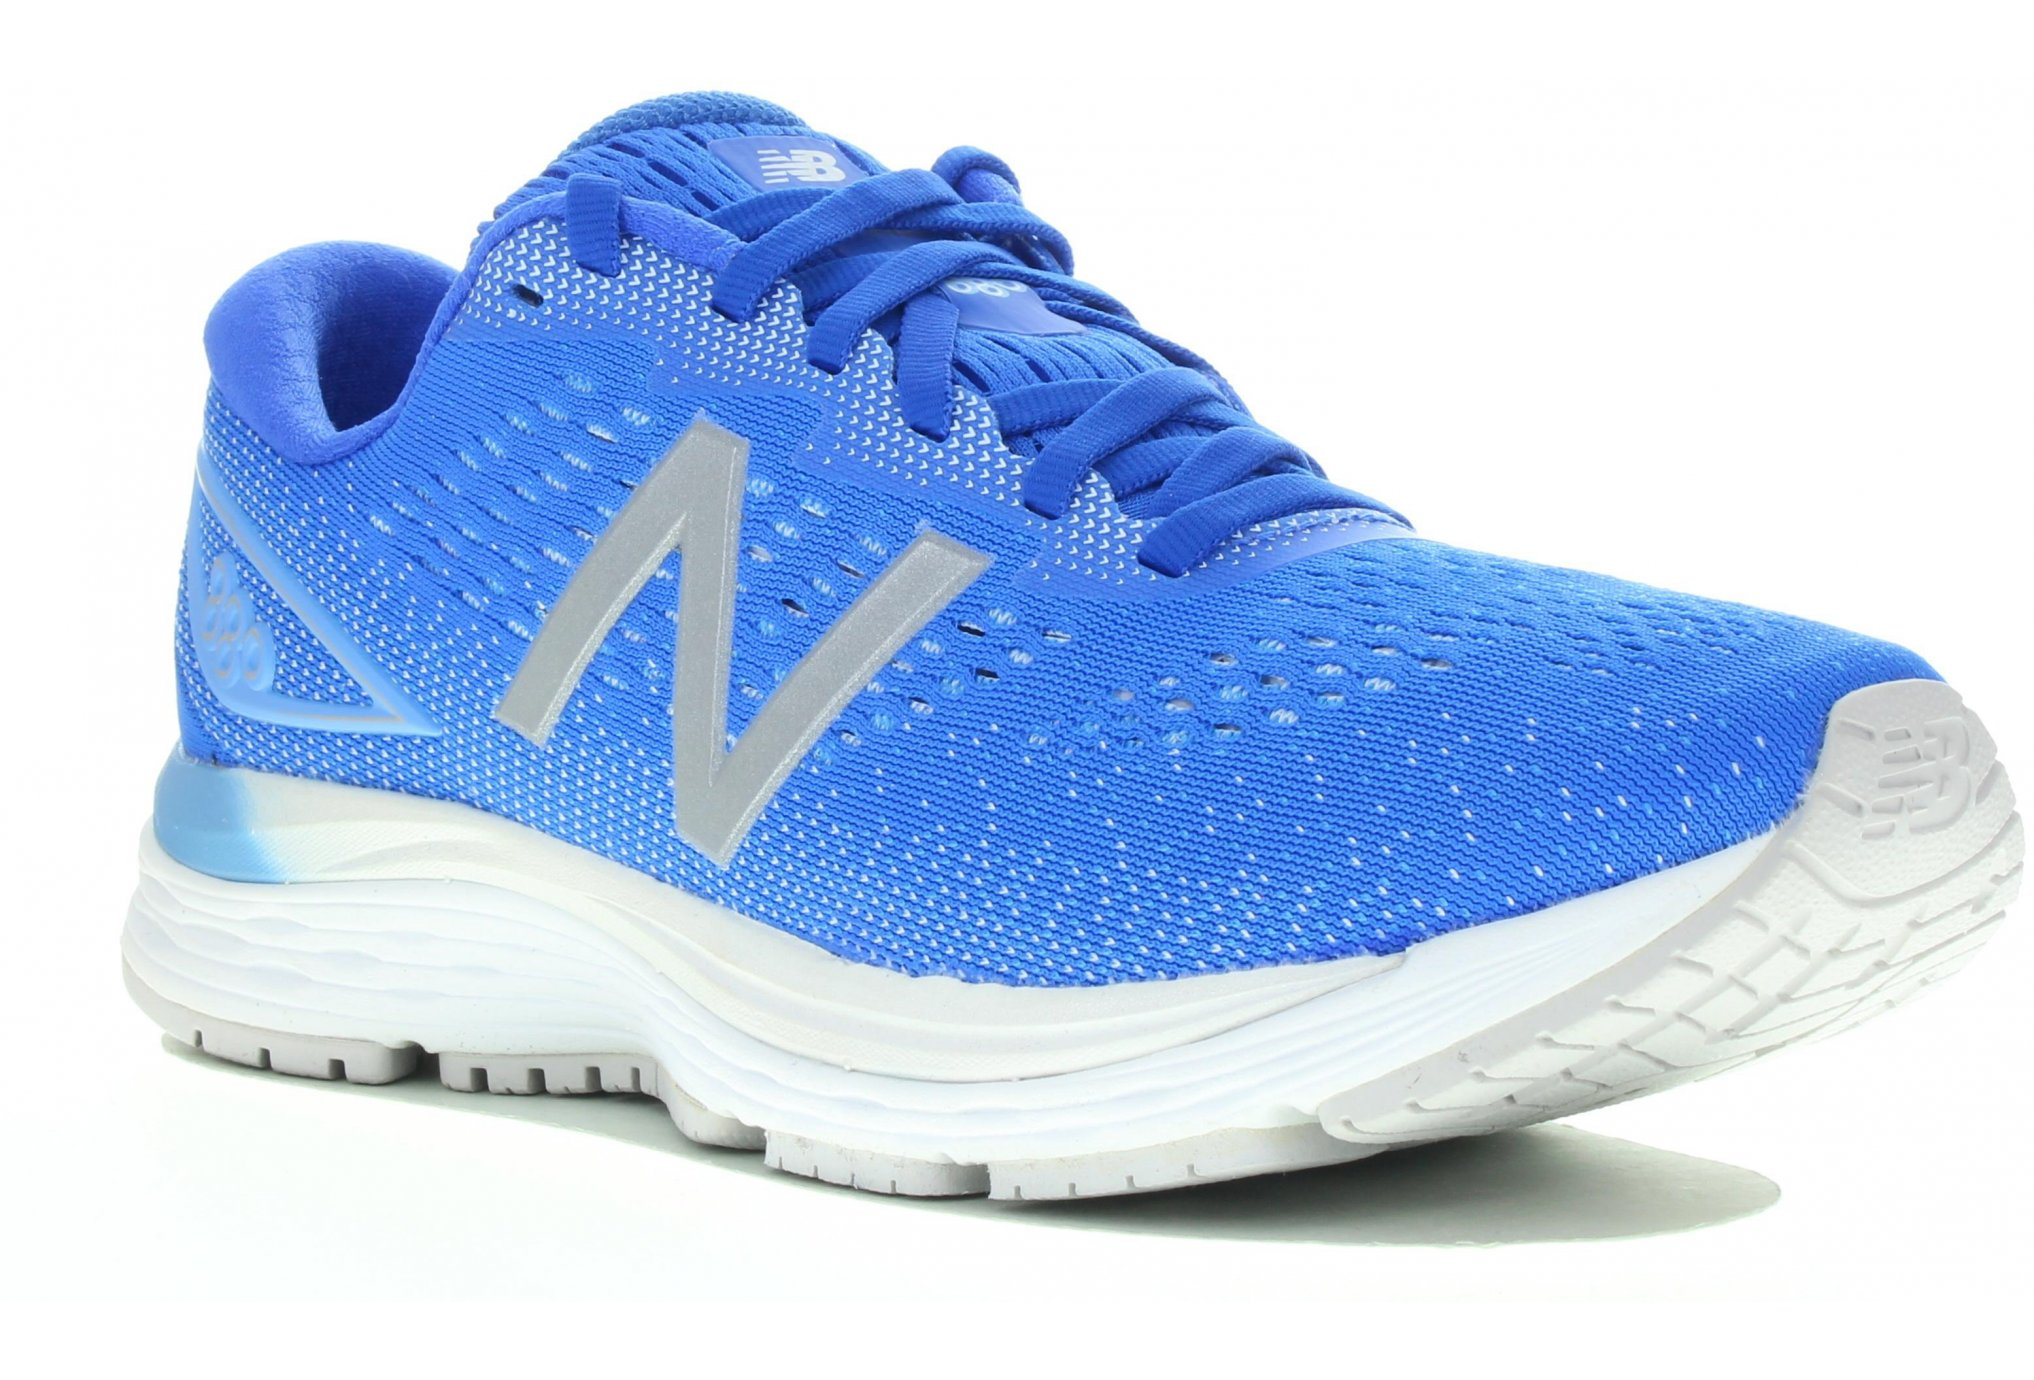 New Balance W 880 V9 - B Chaussures running femme